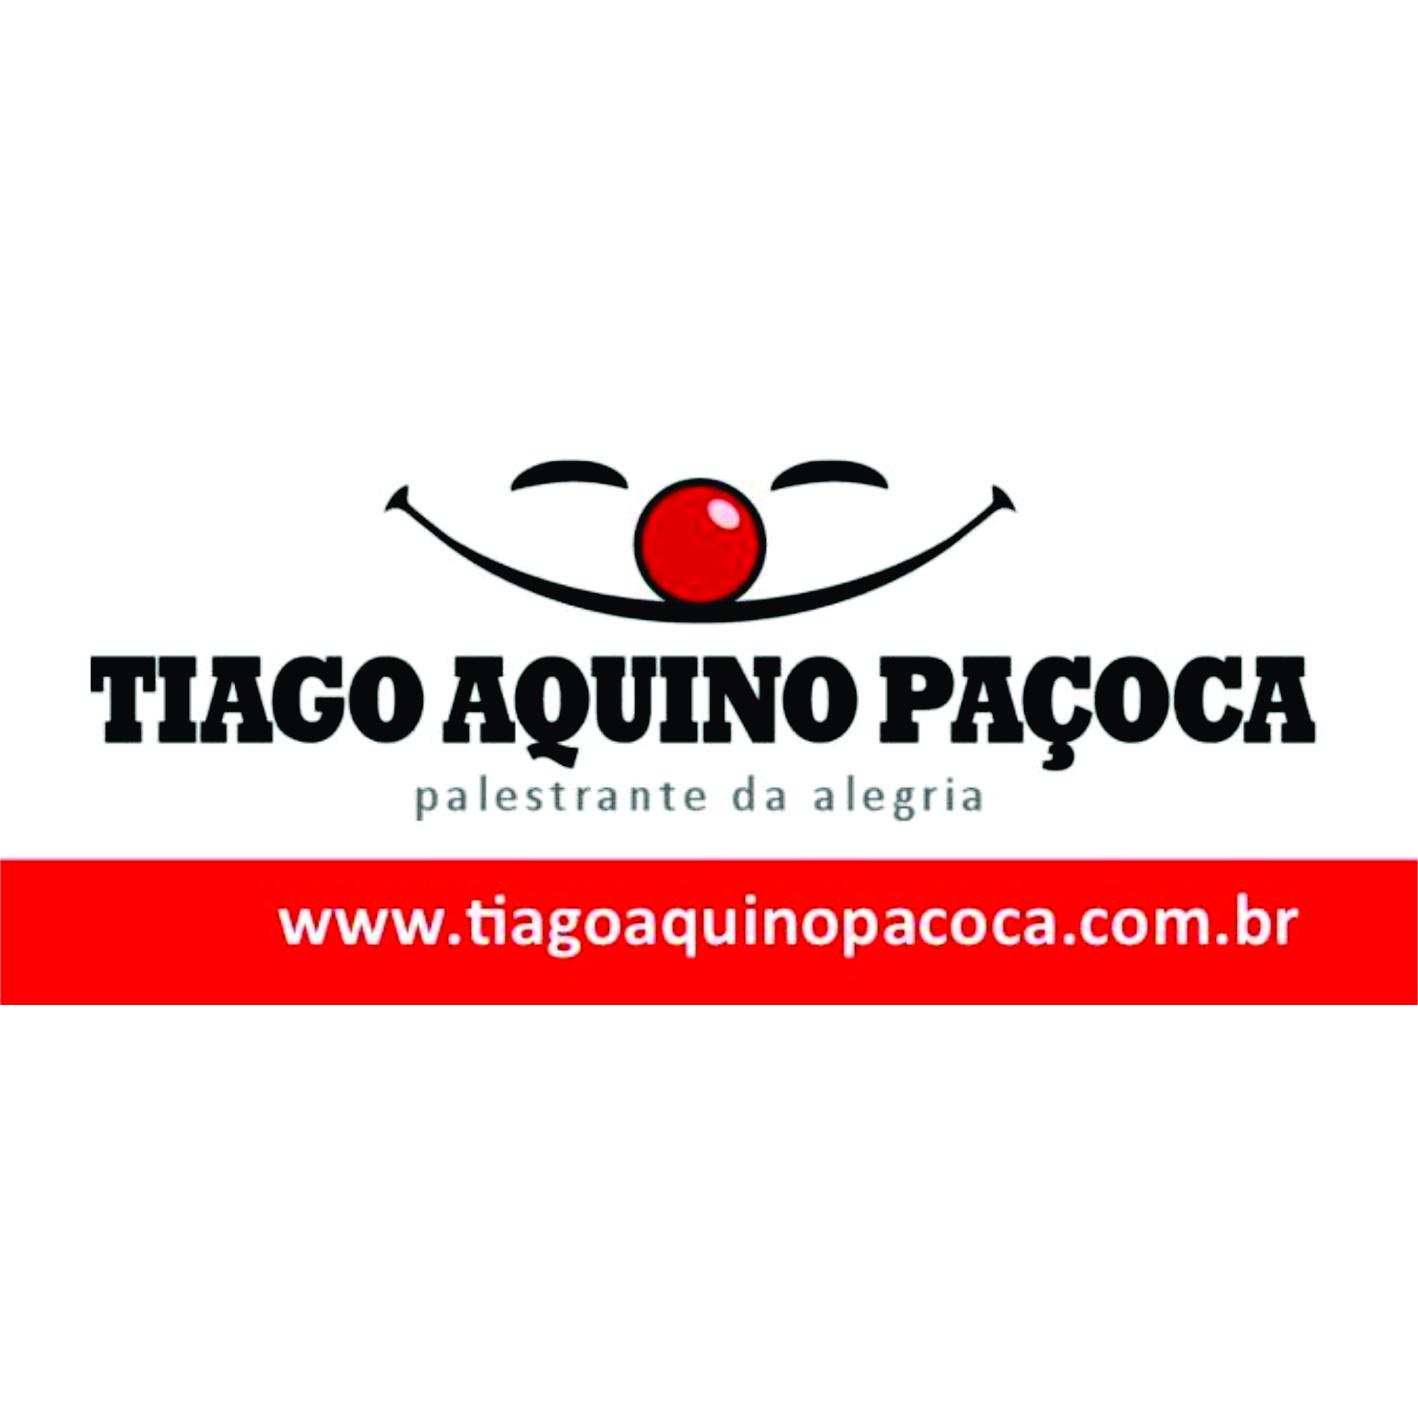 Tiago Aquino Paçoca